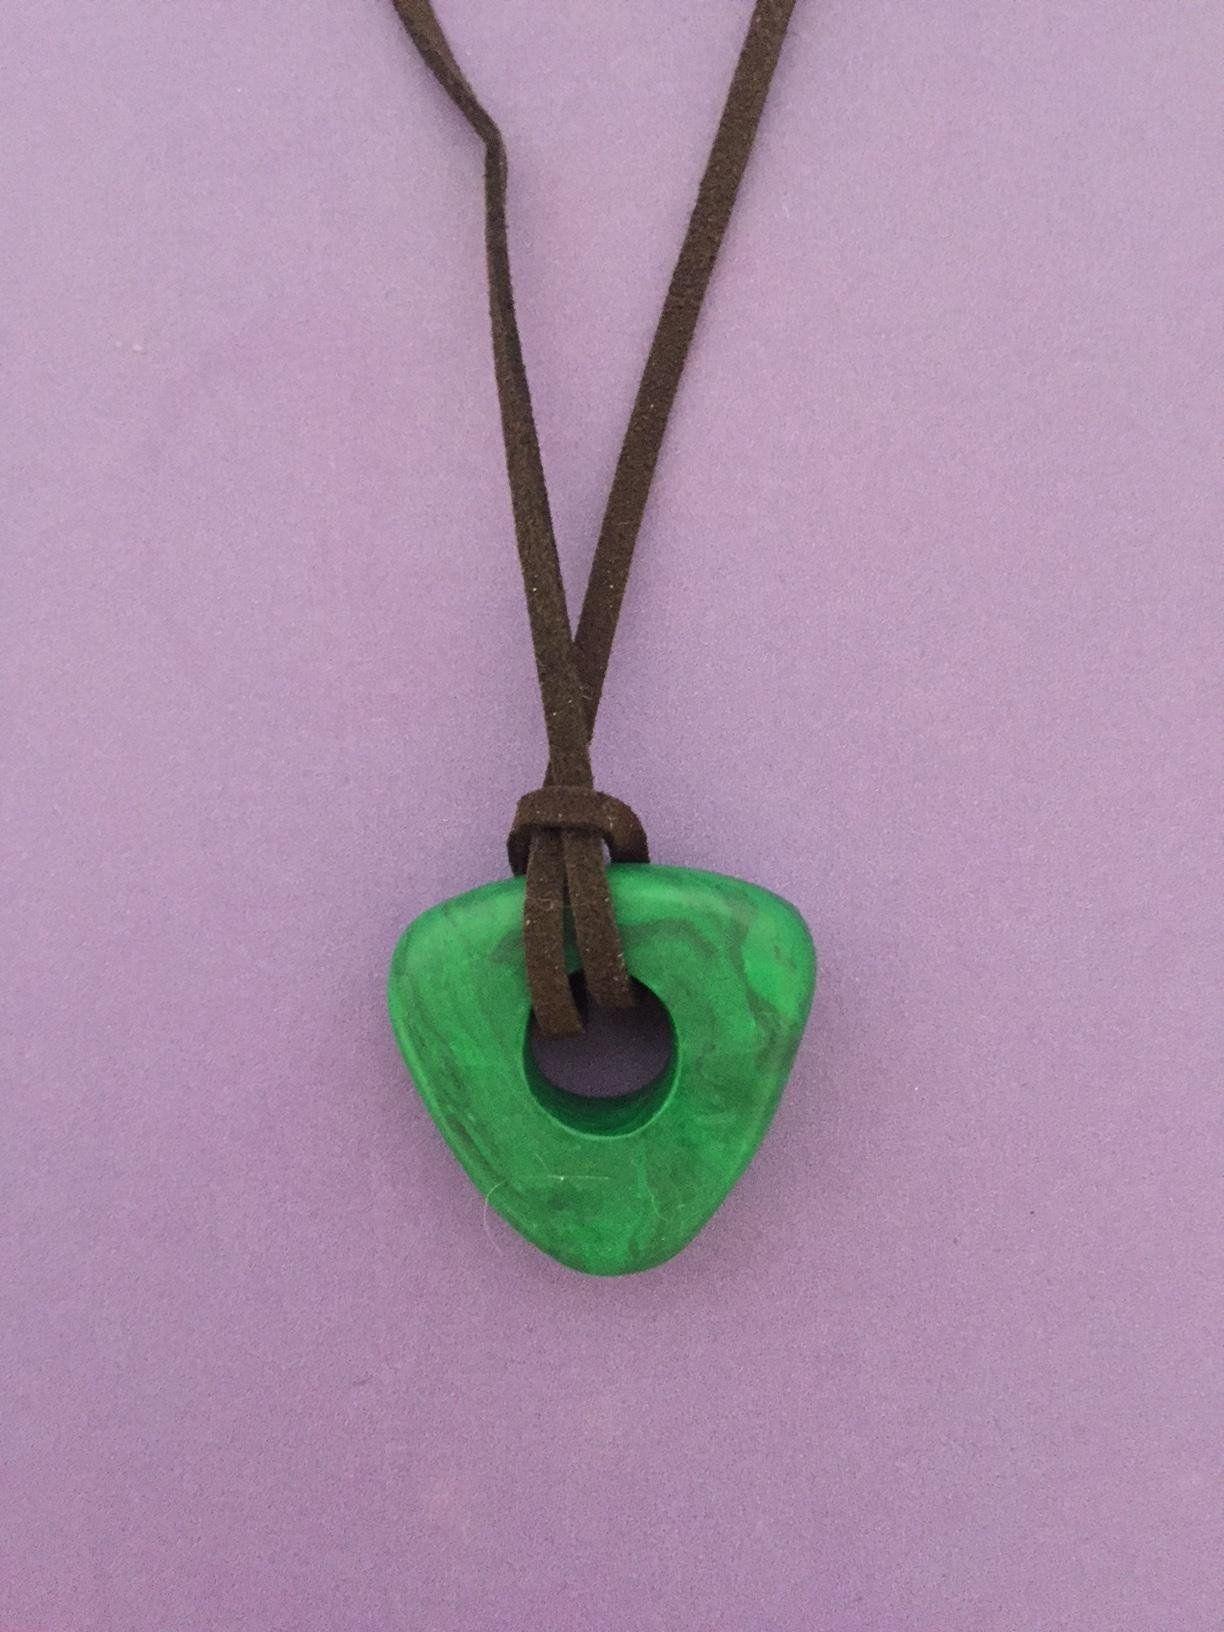 Coraline Seeing Stone Looking Stone Amulet Coraline Necklace Coraline Key Handmade Coraline Coraline Key Handmade